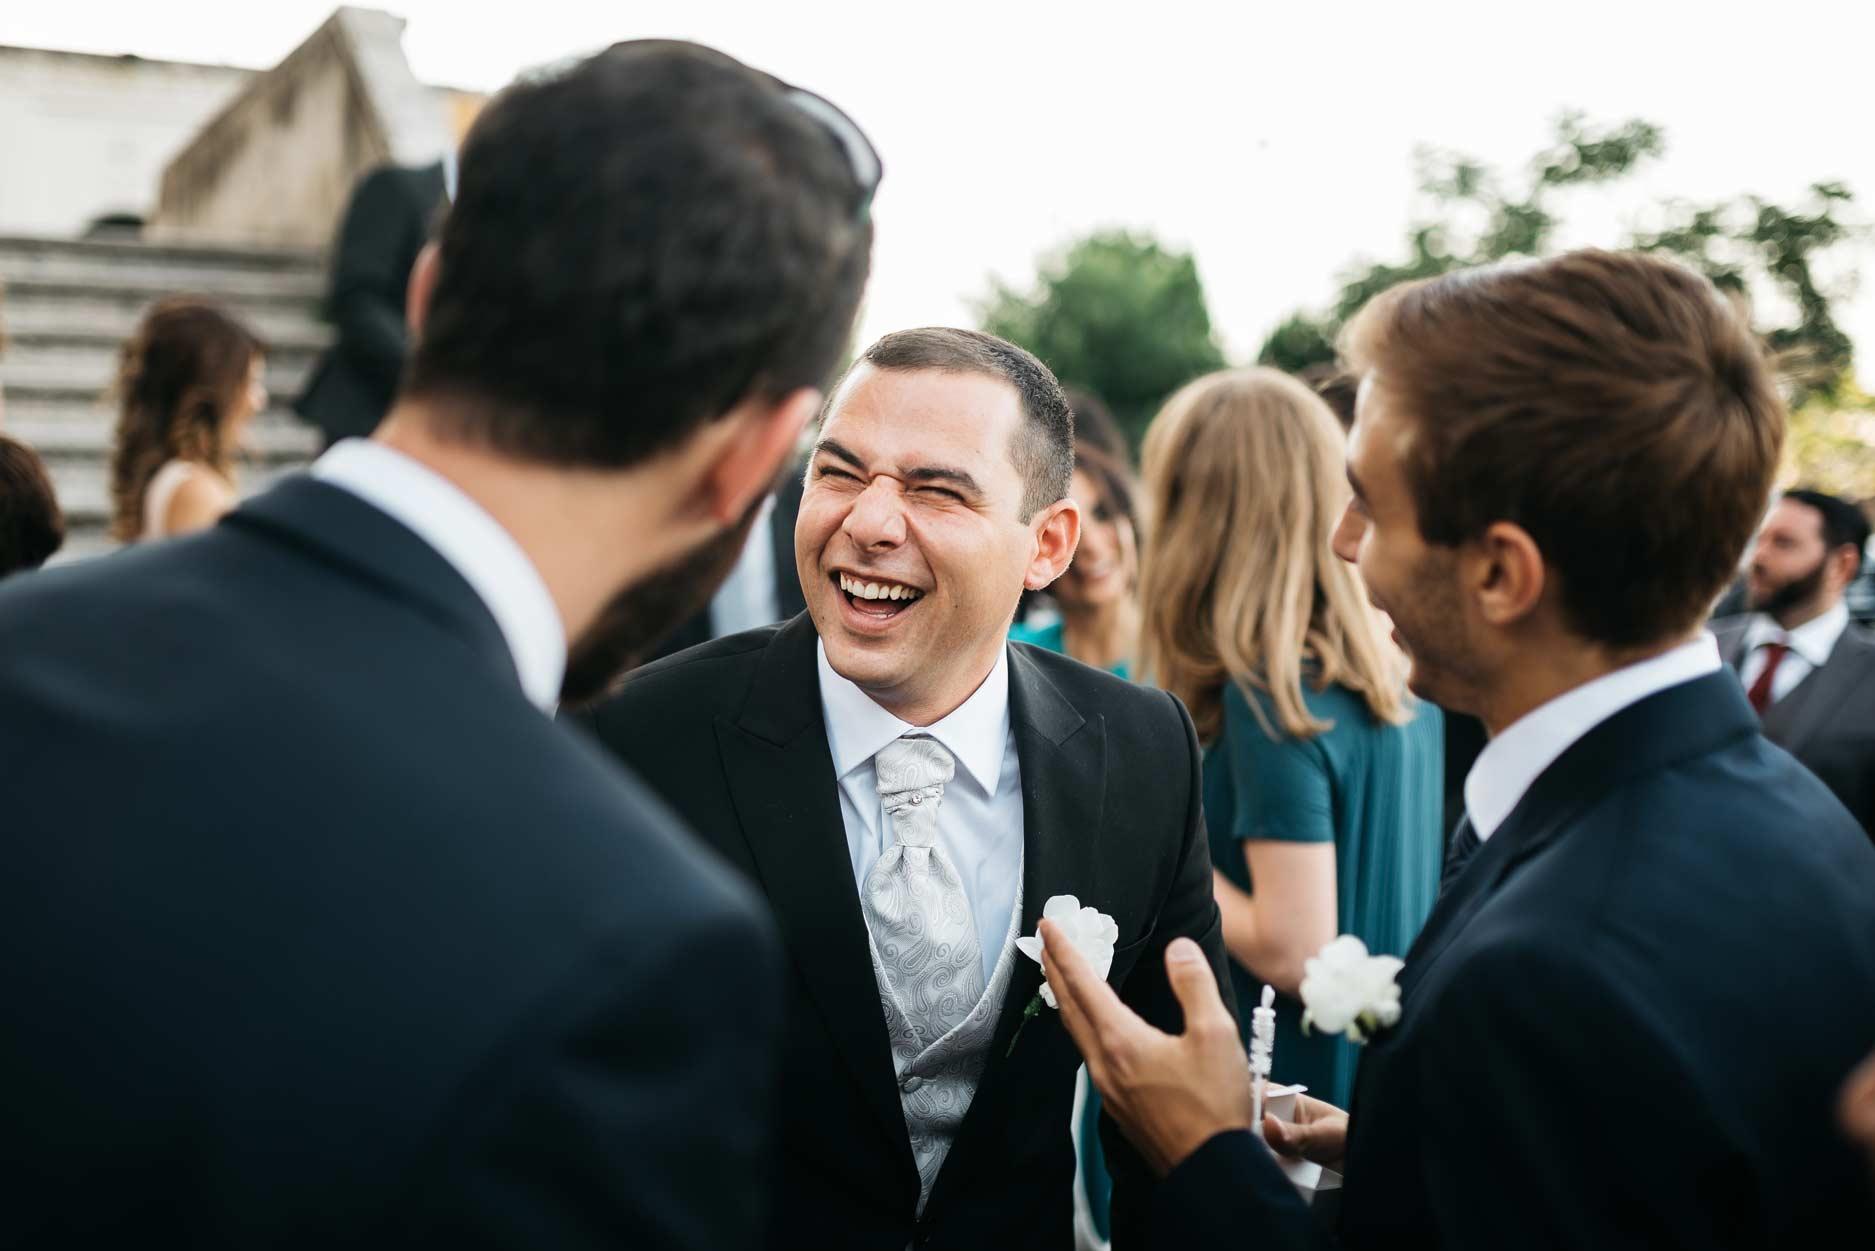 Destination-Wedding-Italy-Reportage-Photographer-Ceremony